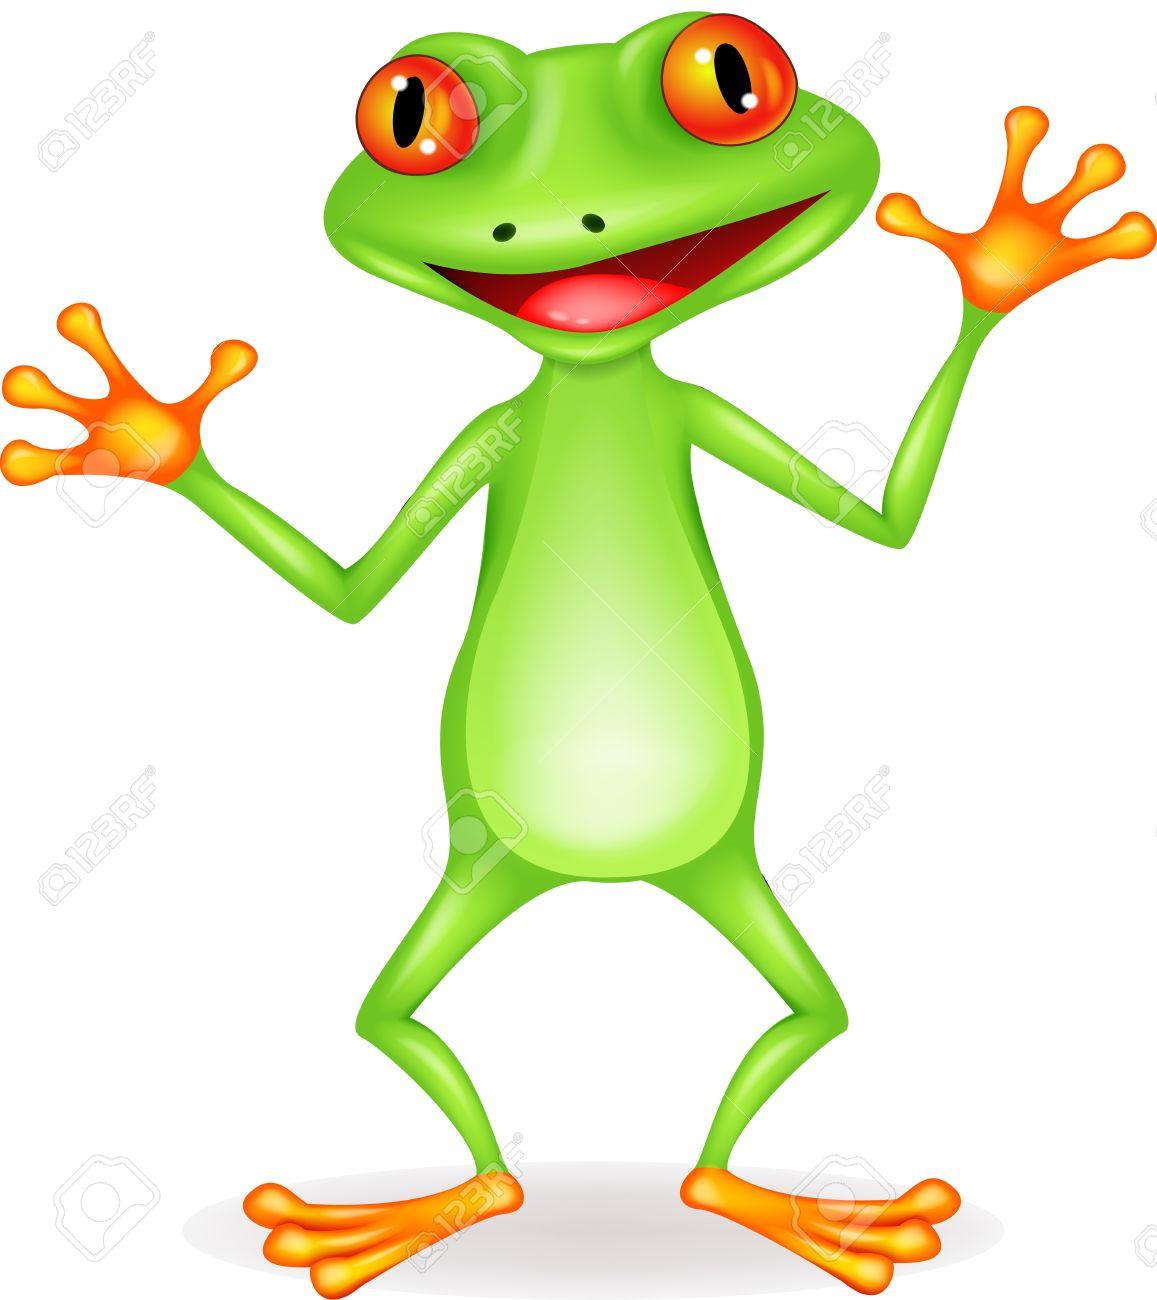 1157x1300 Funny Frog Cartoon Royalty Free Cliparts, Vectors, And Stock